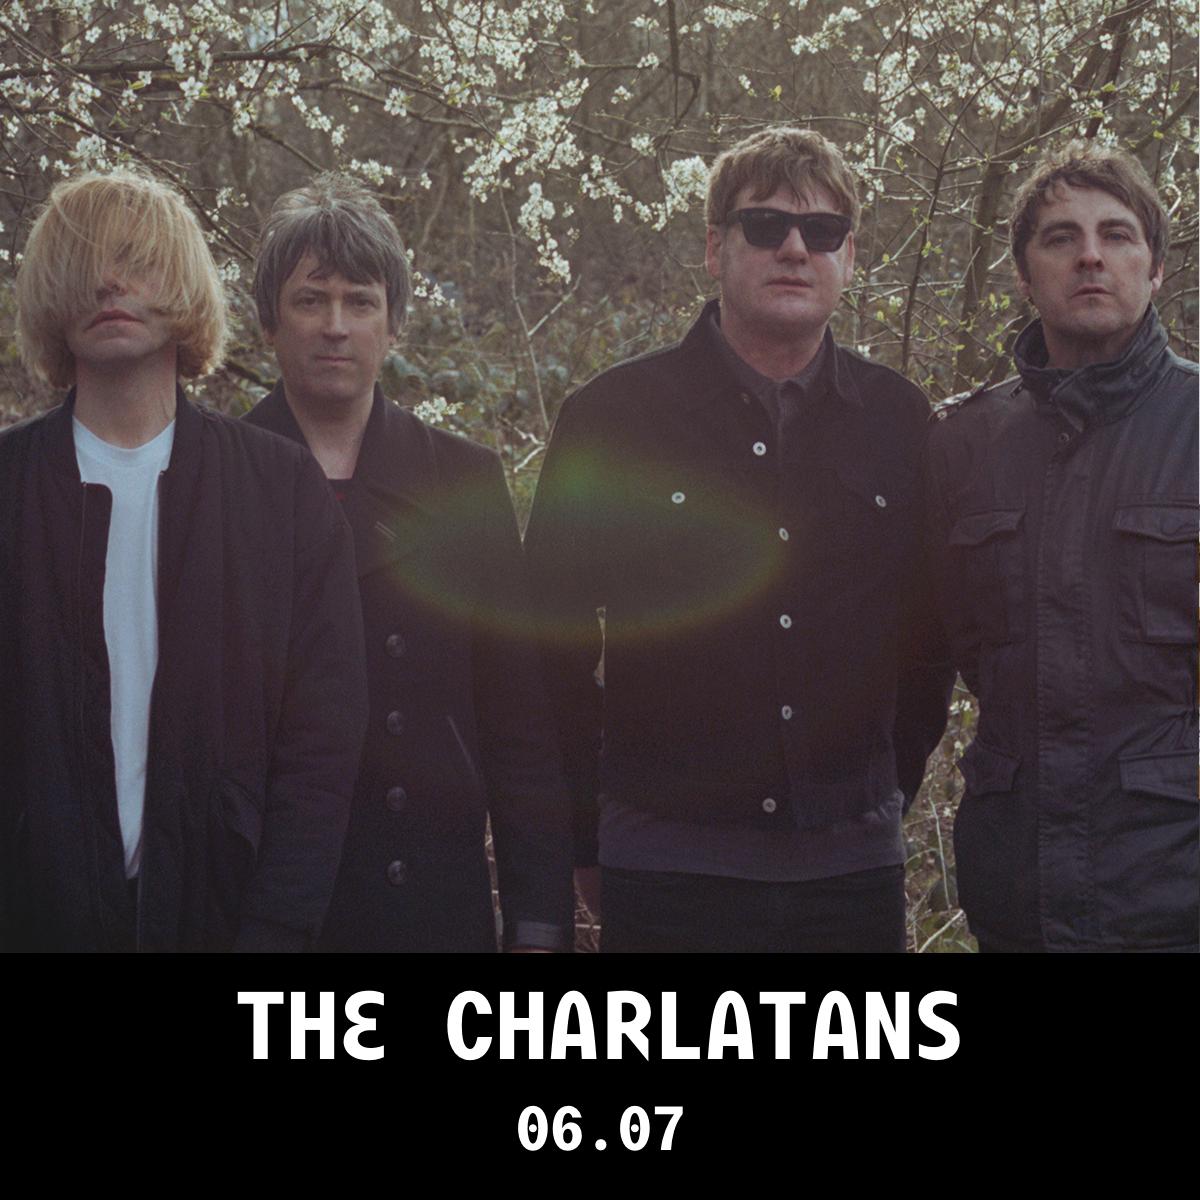 THE CHARLATANS